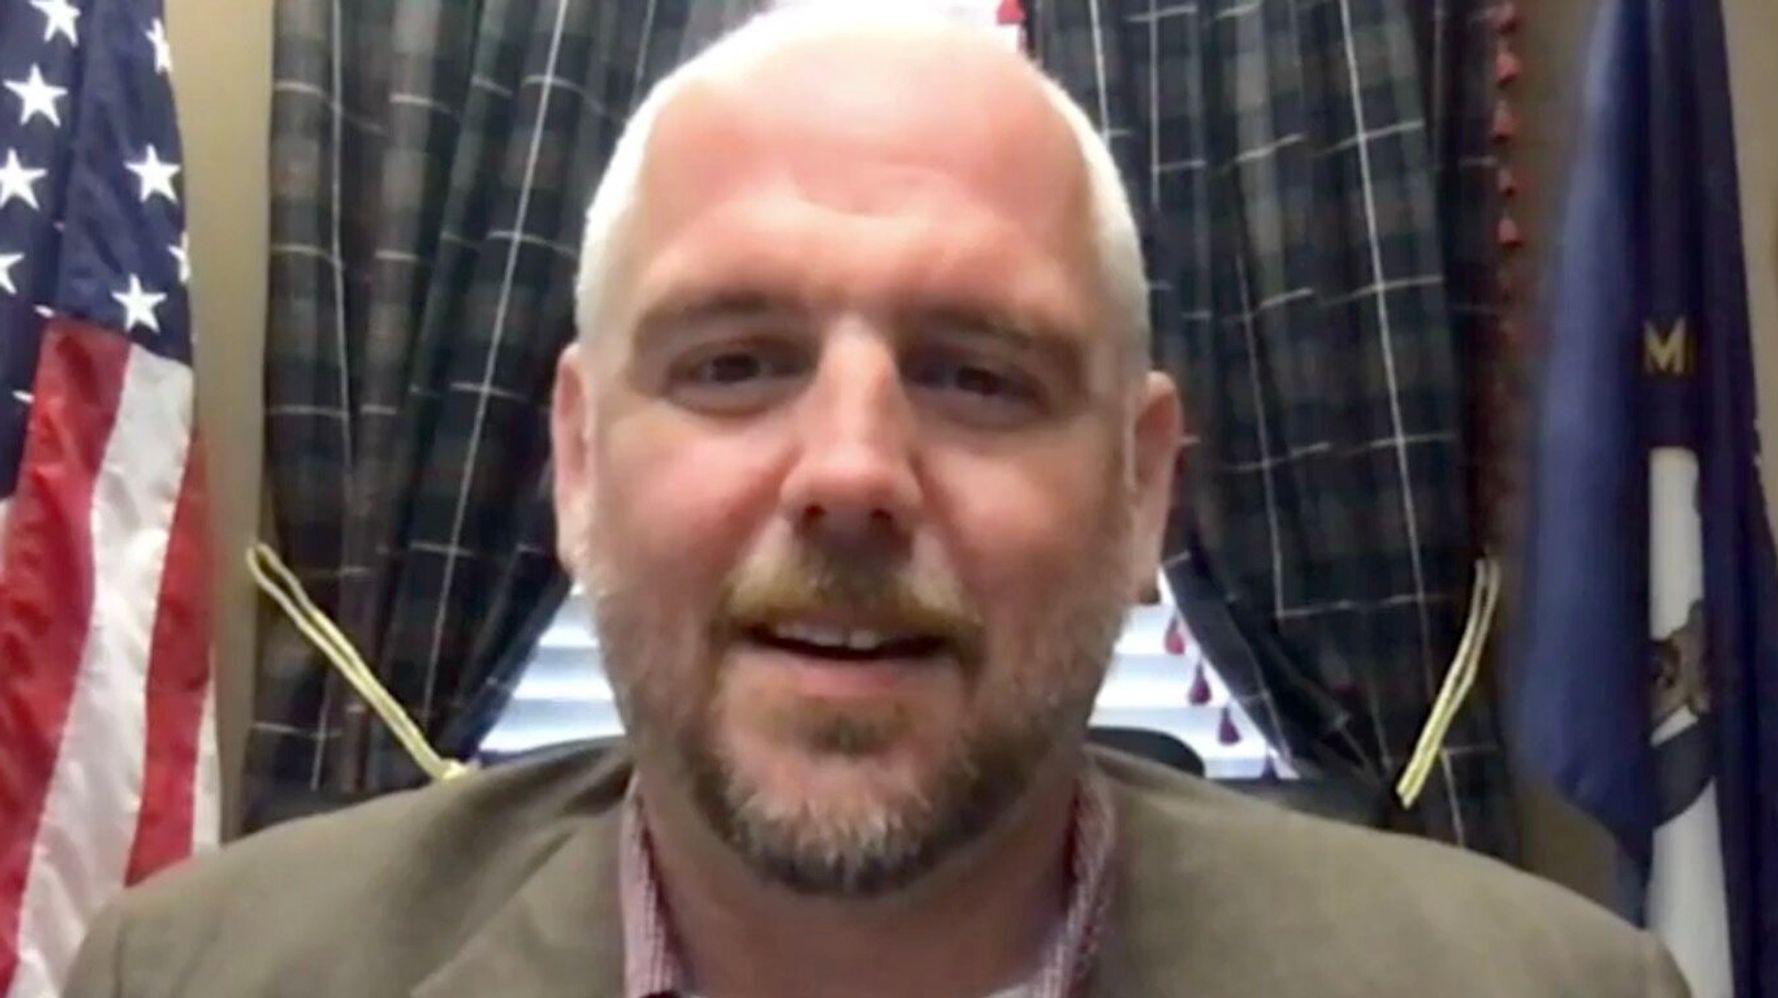 'Listen Up, Dips**ts': Kentucky Mayor Rips People Ignoring Coronavirus Warnings